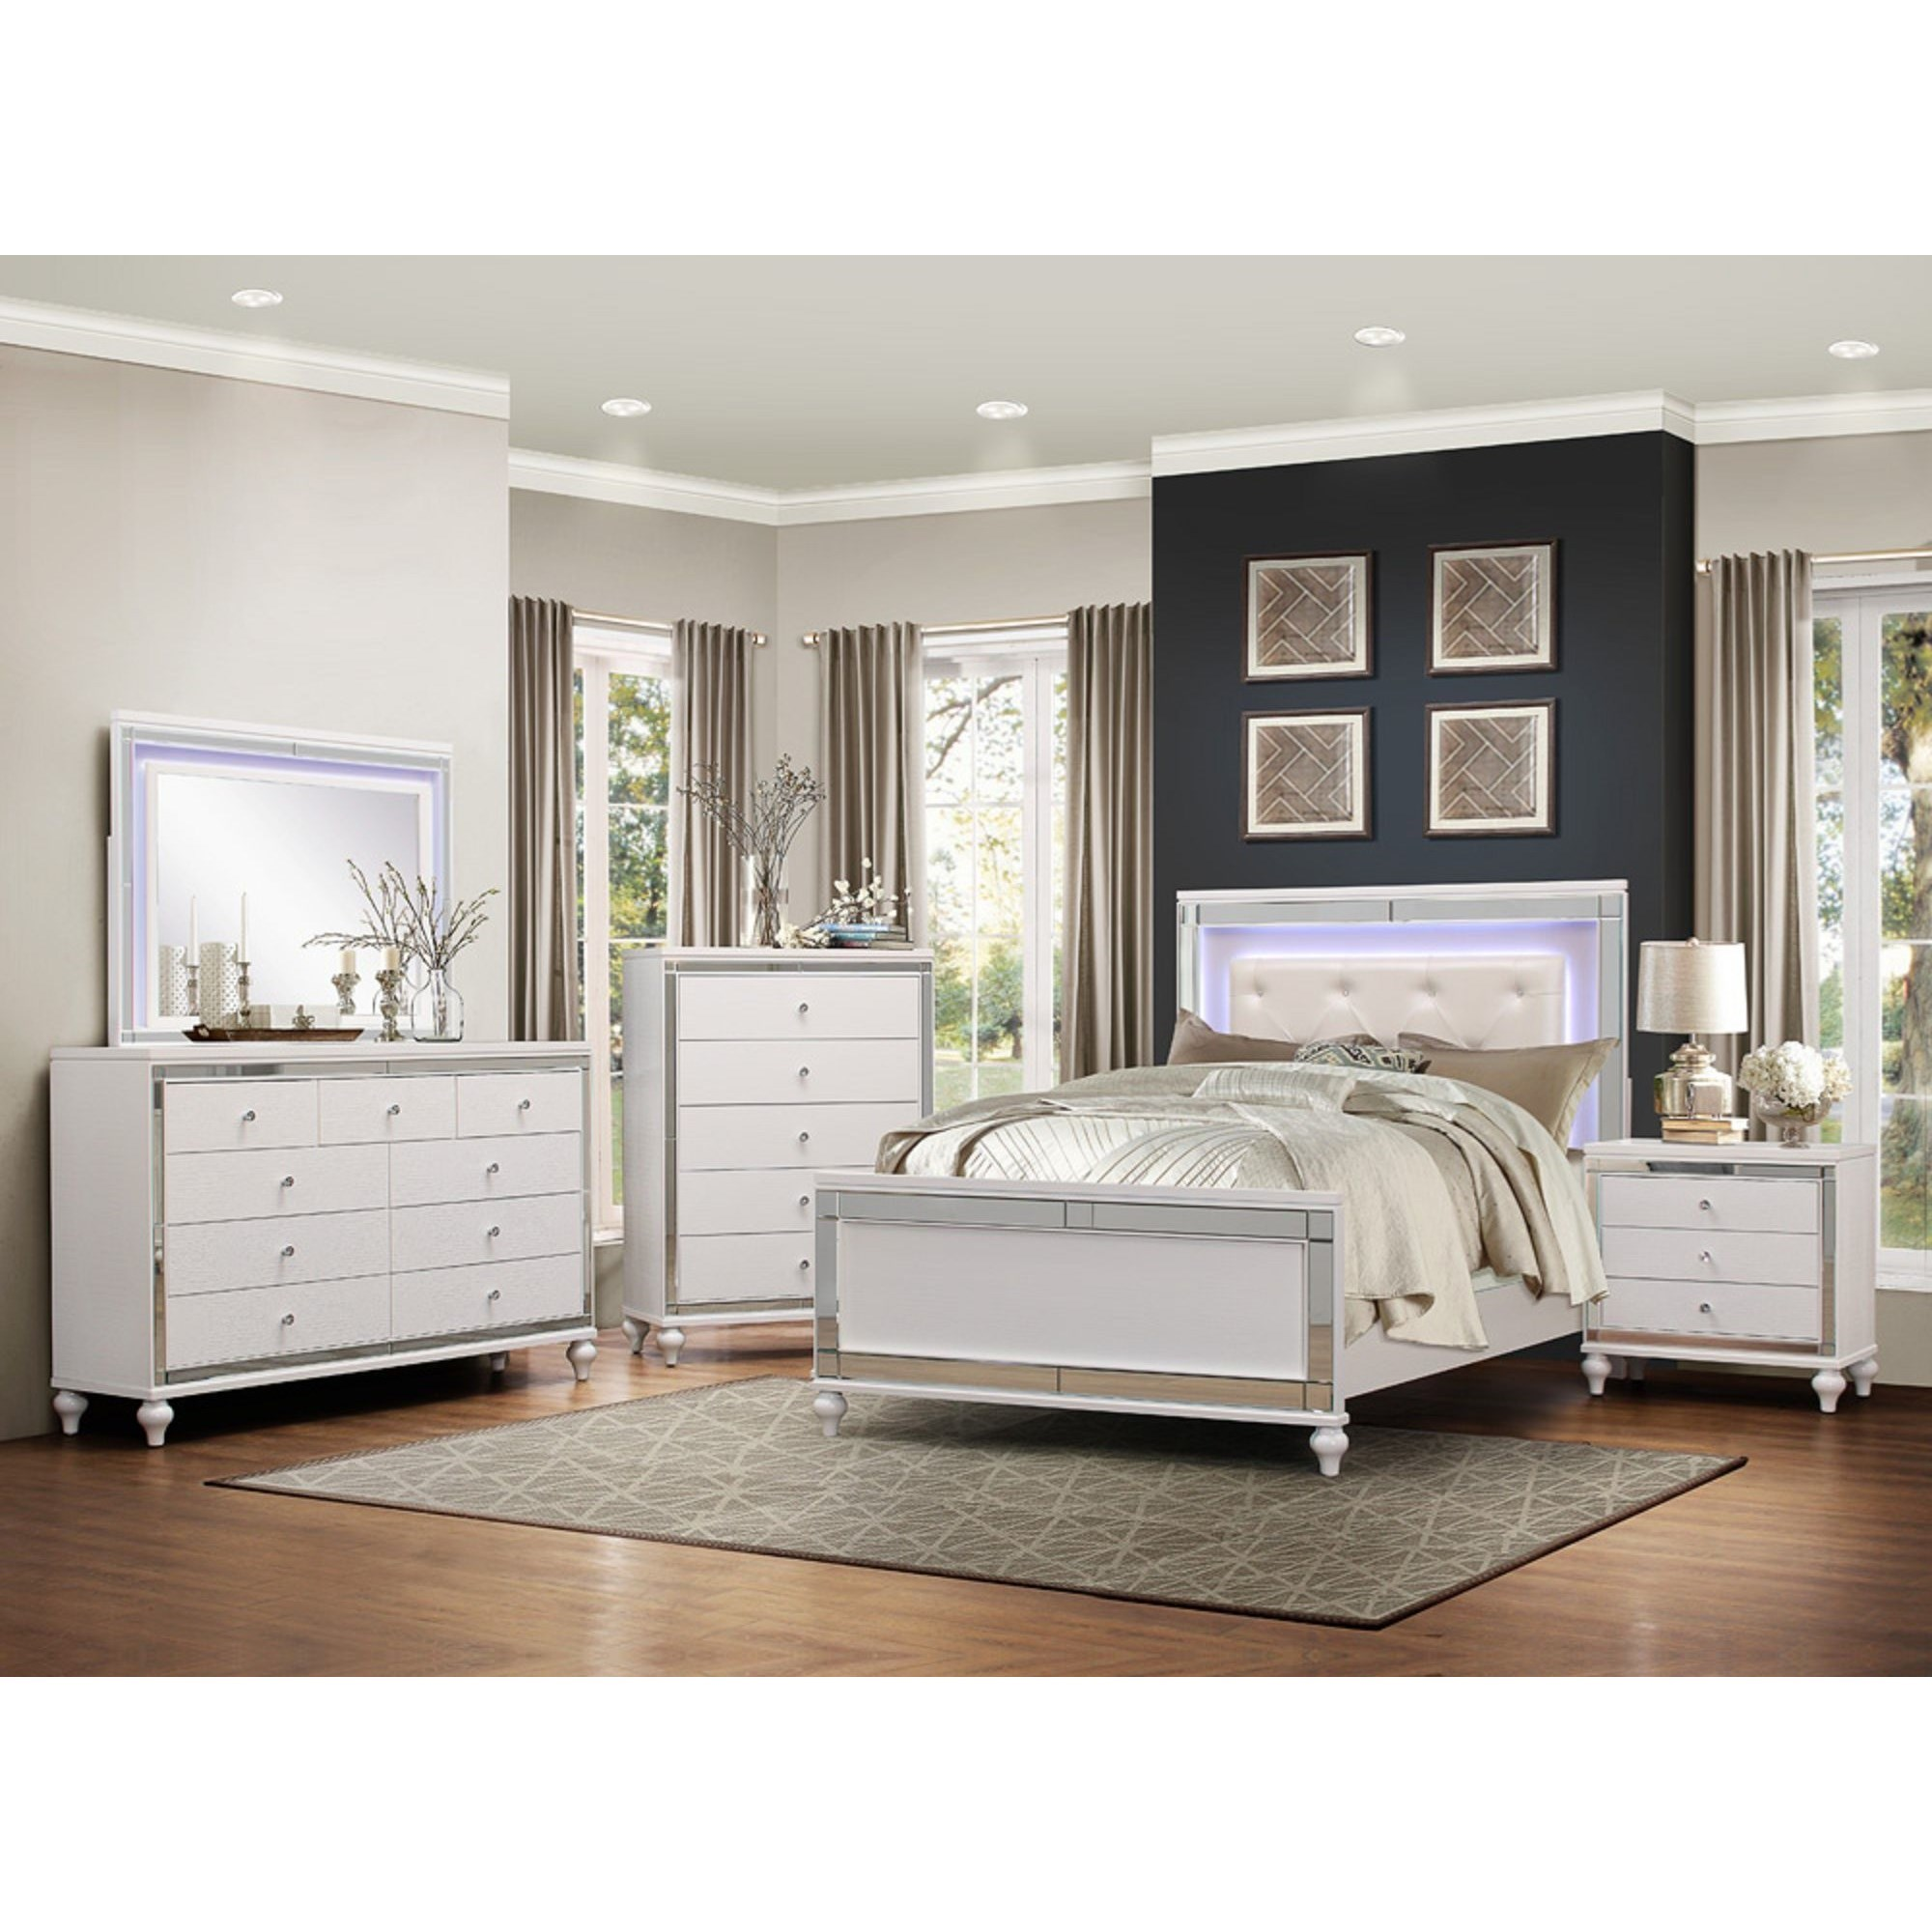 Alonza King Lit Bedroom Group by Homelegance at Carolina Direct